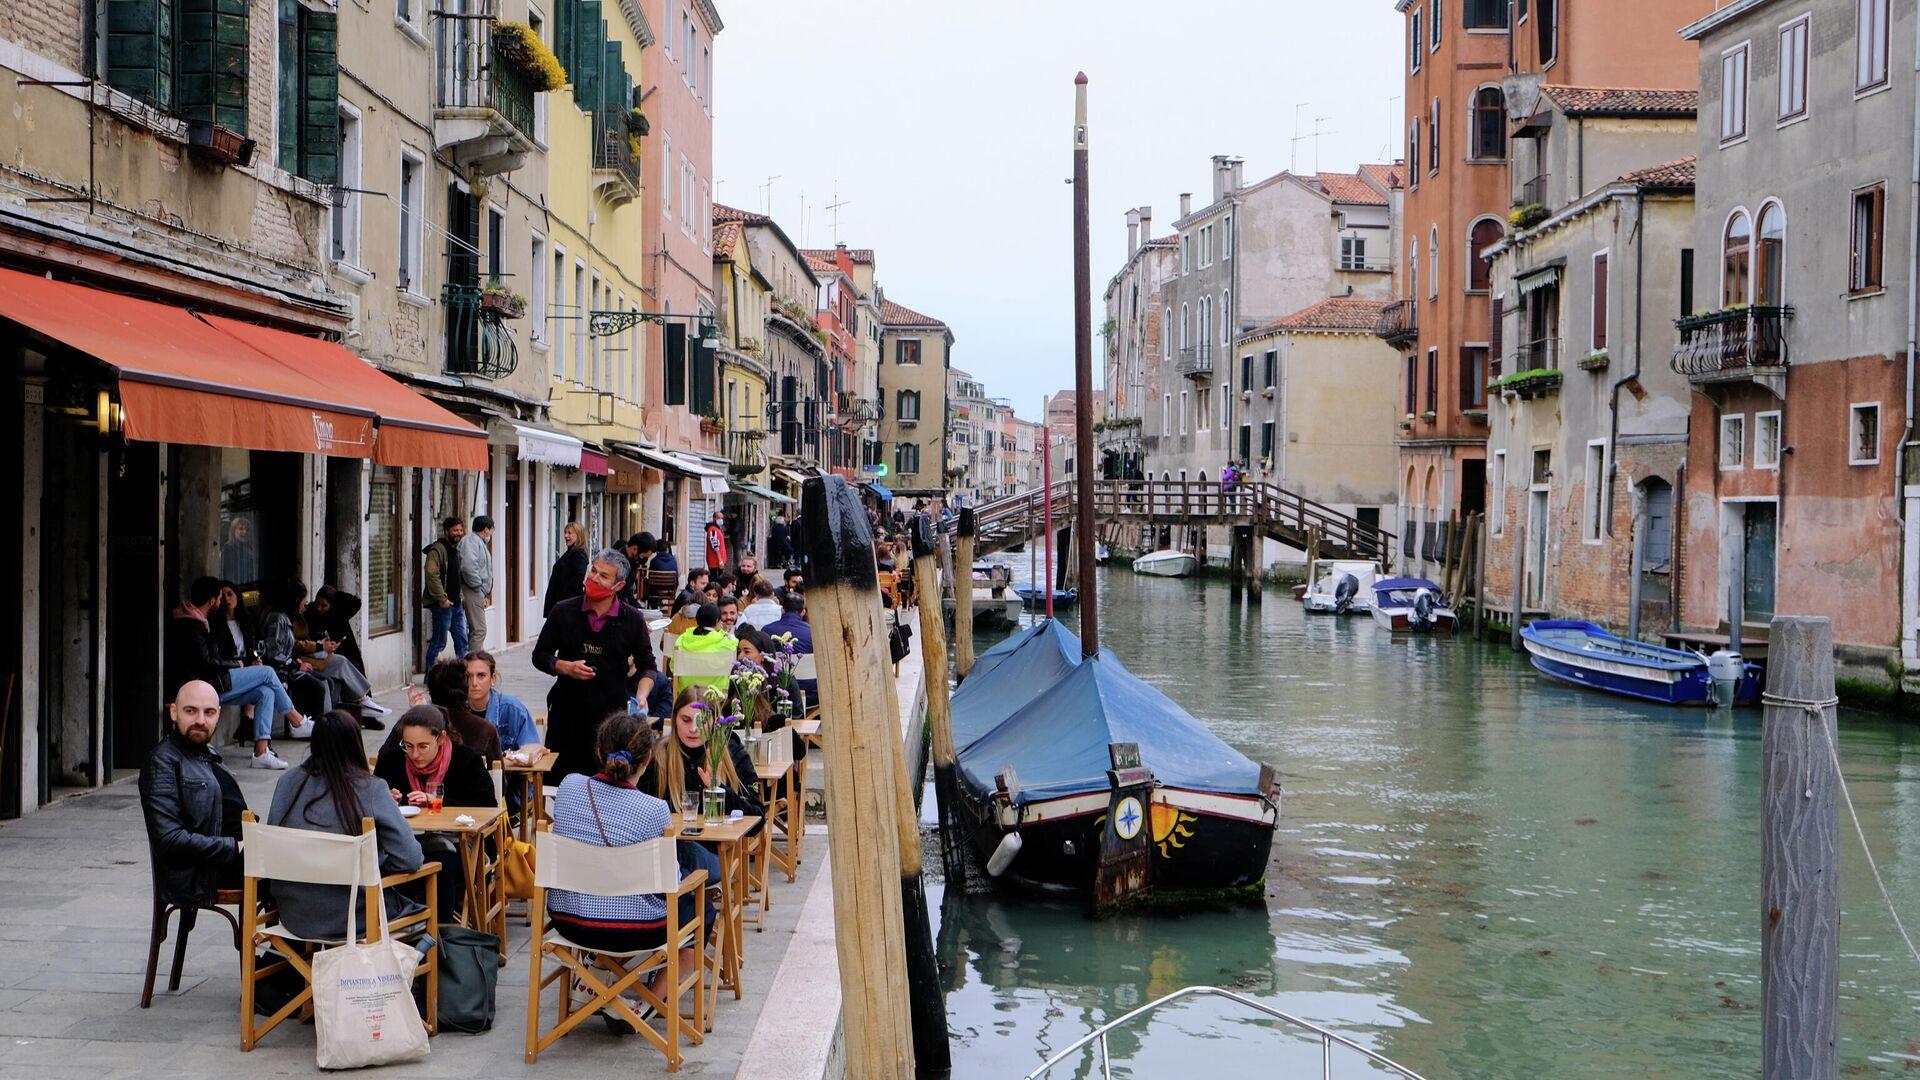 Venecia, Italia - Sputnik Mundo, 1920, 03.05.2021